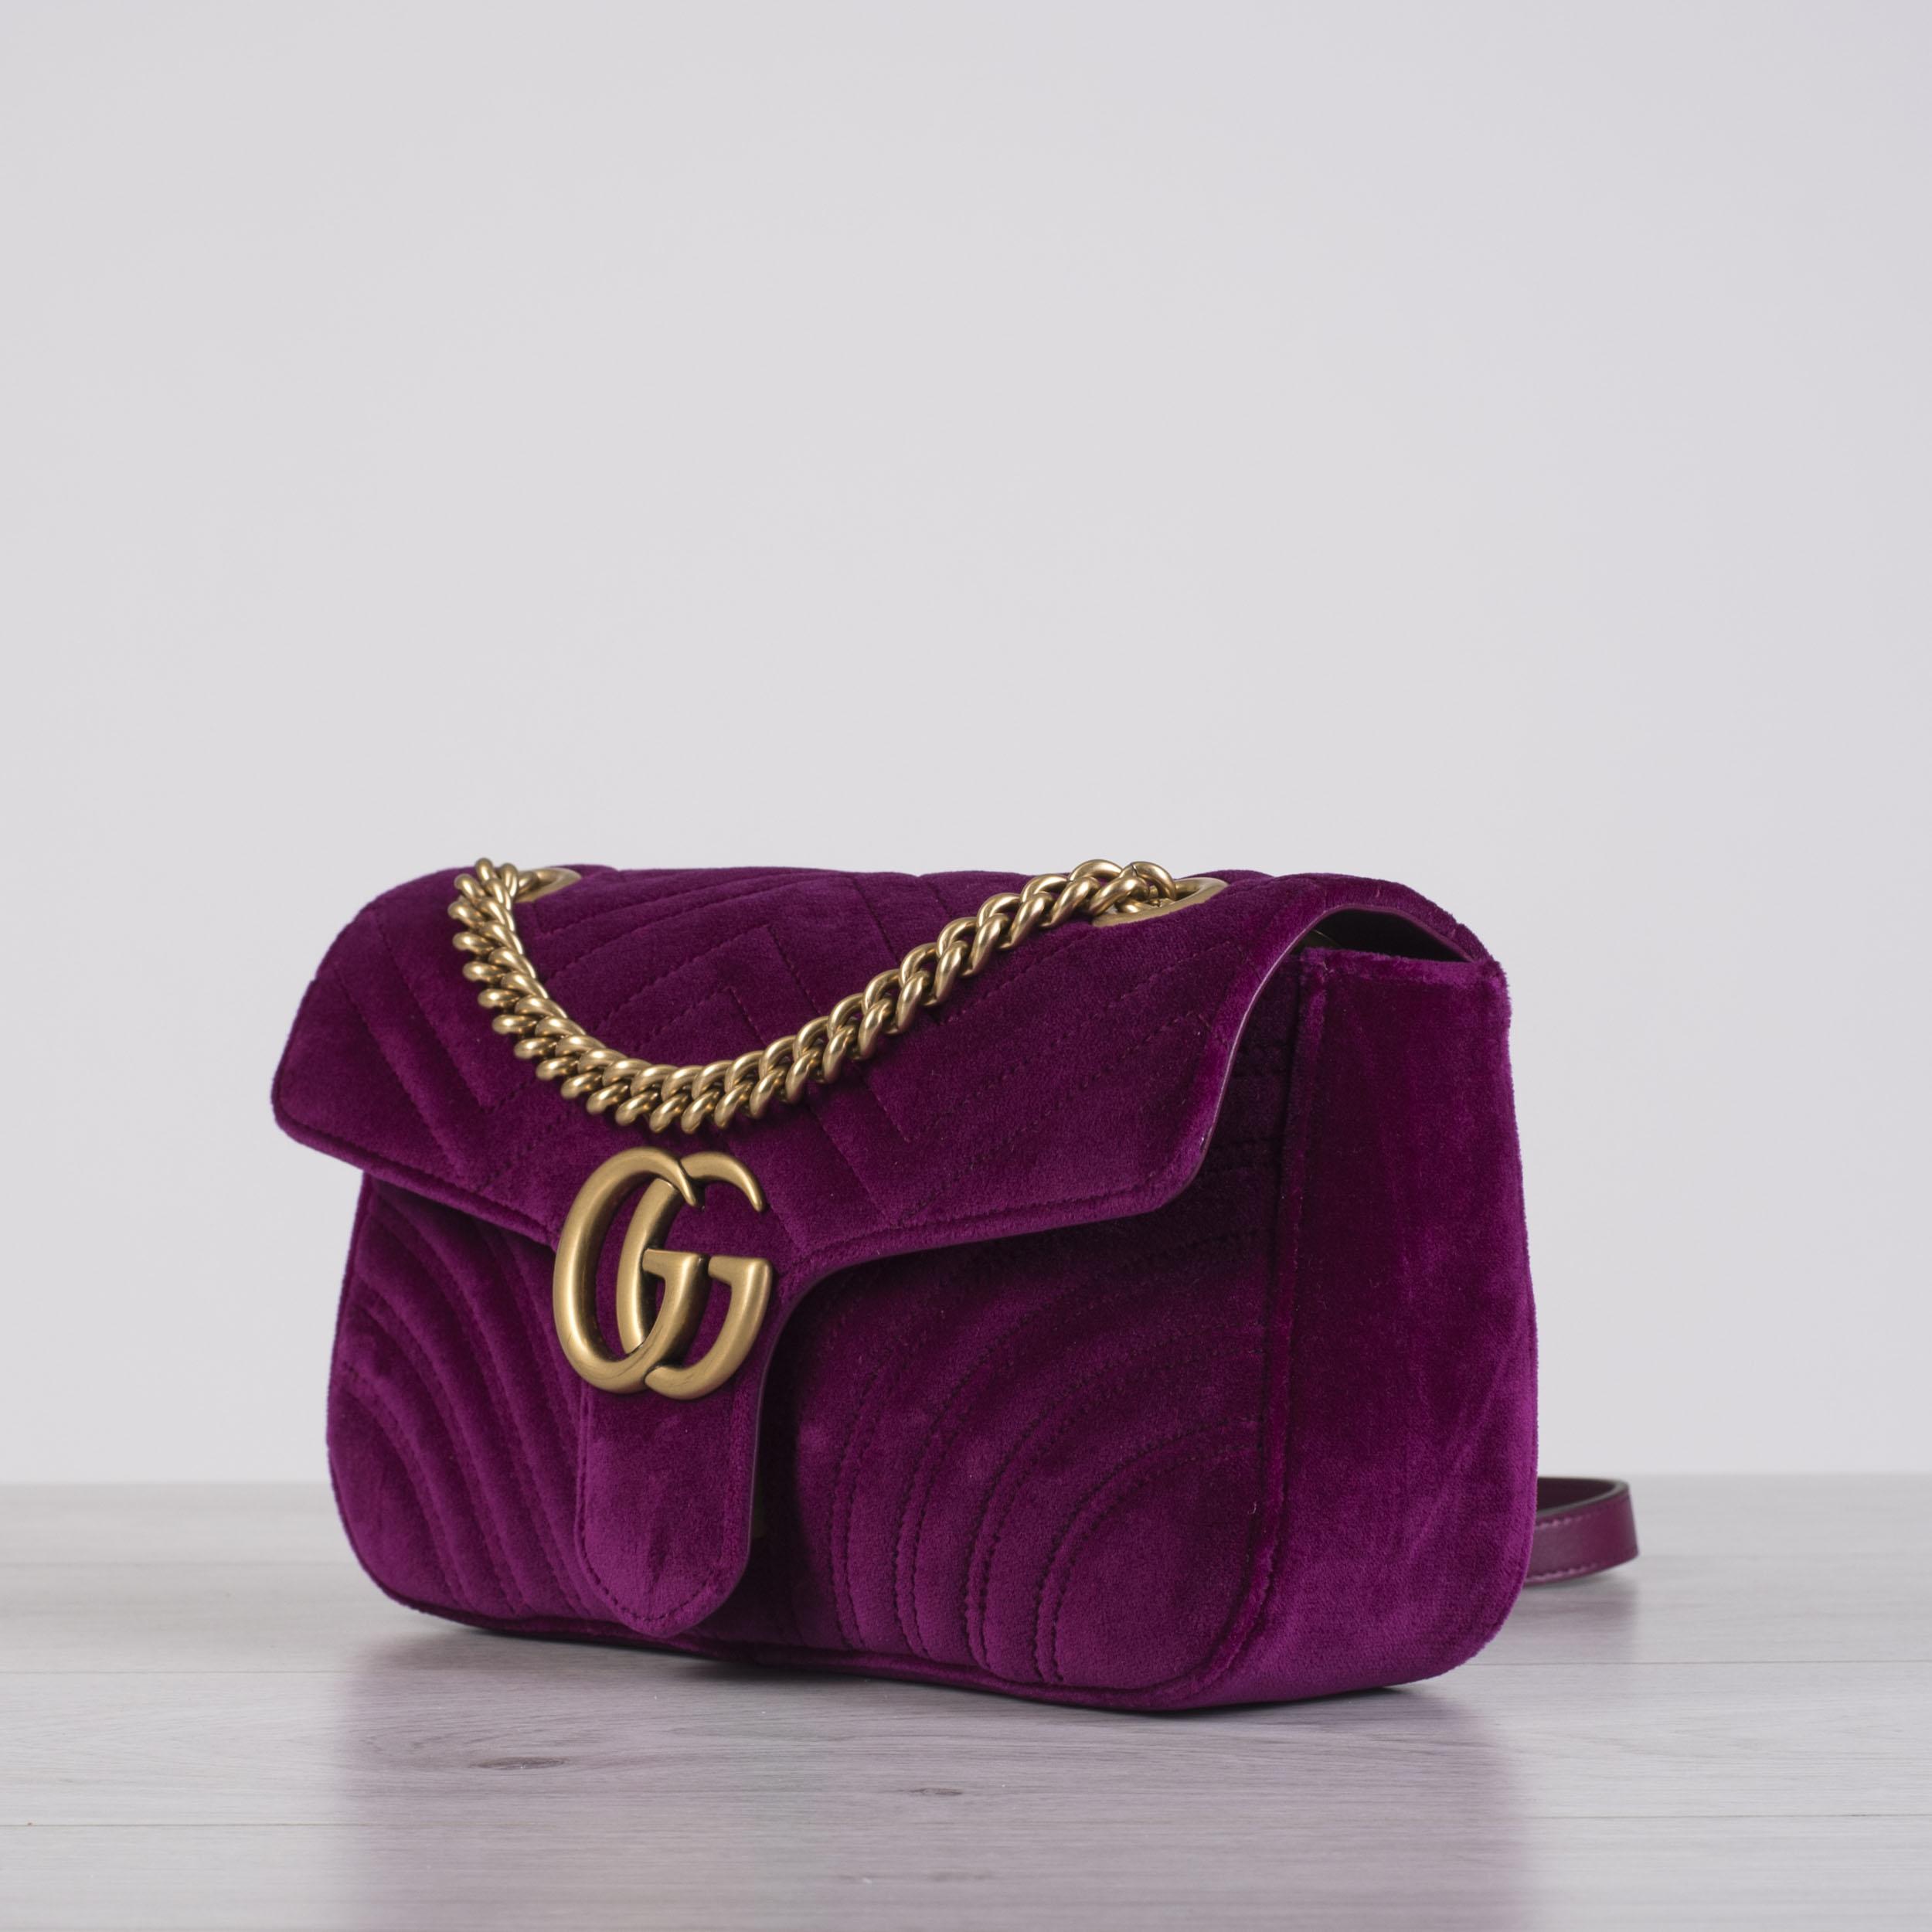 6ad81bc50df5 GUCCI 1890$ Small GG Marmont Matelasse Shoulder Bag In Rubin Velvet ...